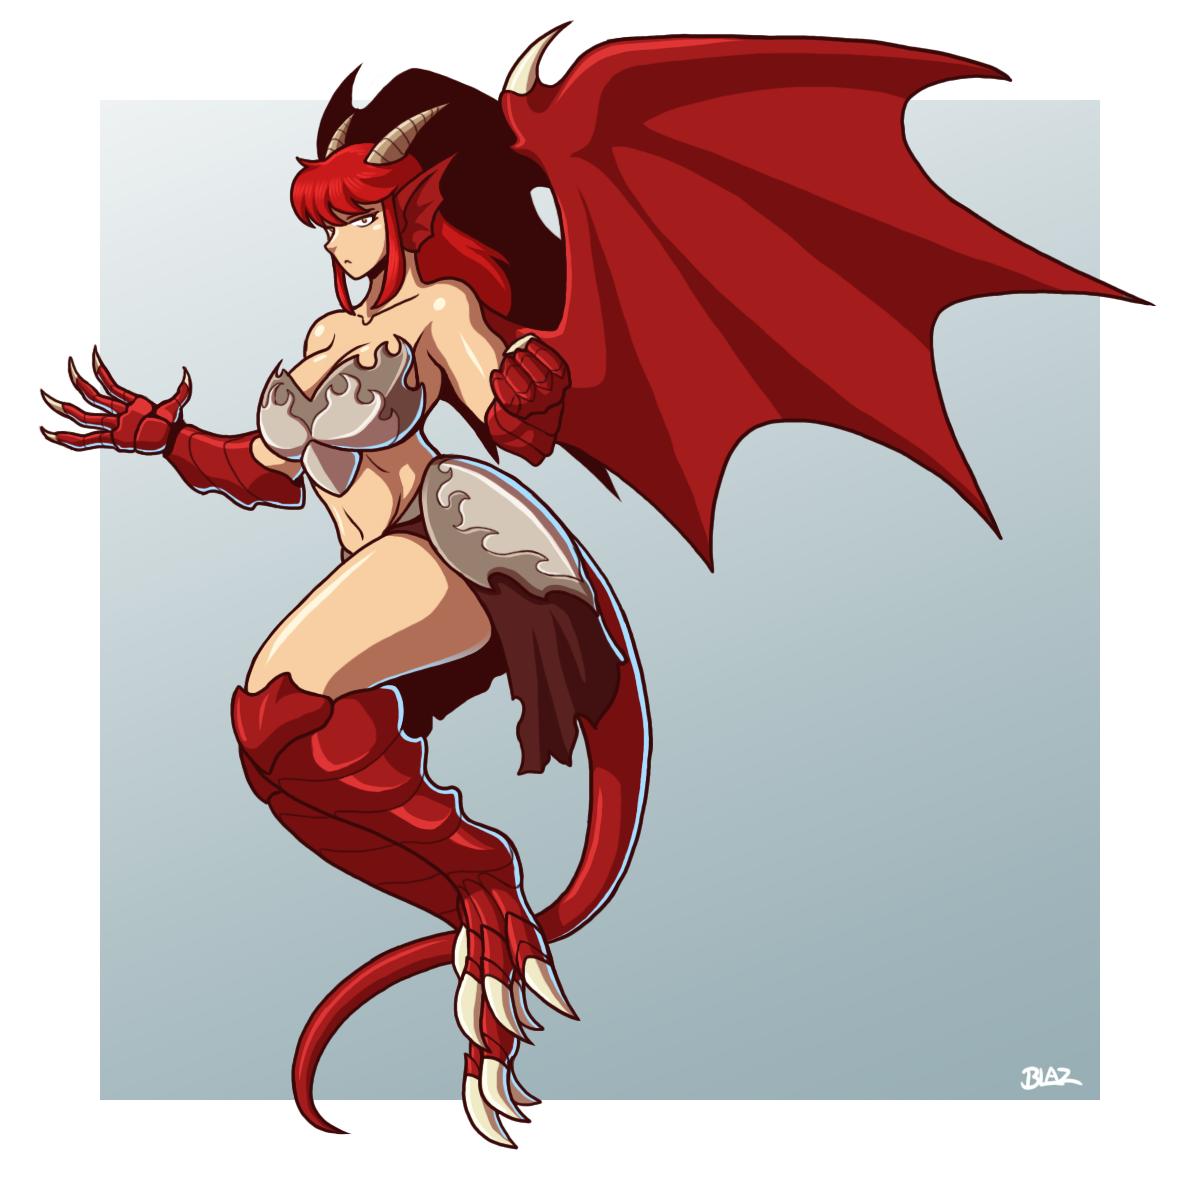 silver the dragongirl by blazbaros on deviantart